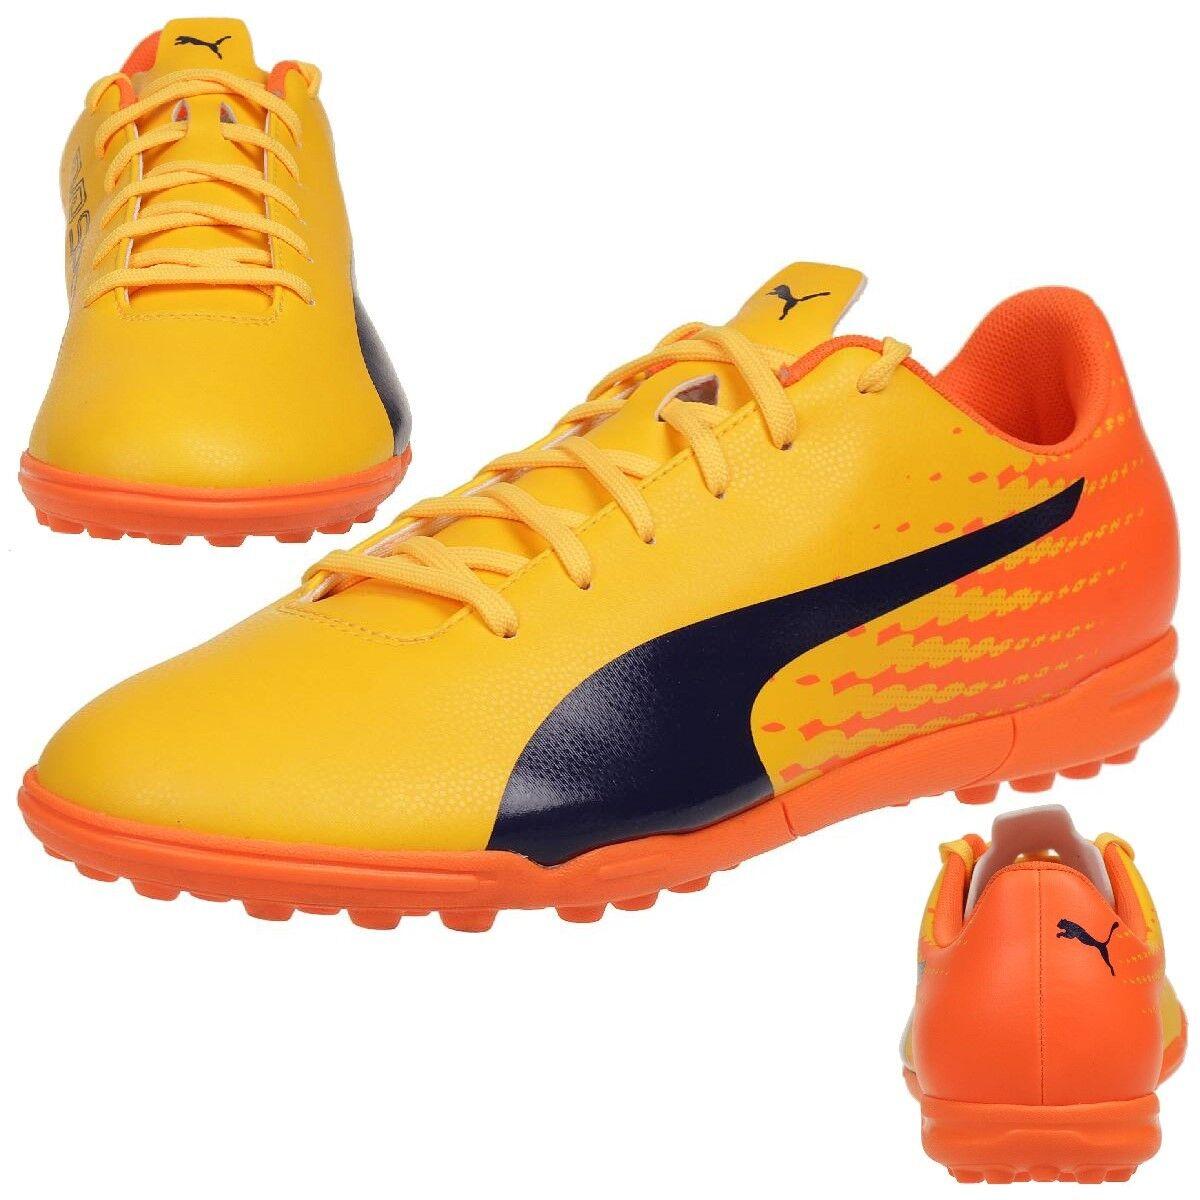 Puma Zapatos de Fútbol Evospeed 17.5 Tt Fútbol Hombre 104026 03